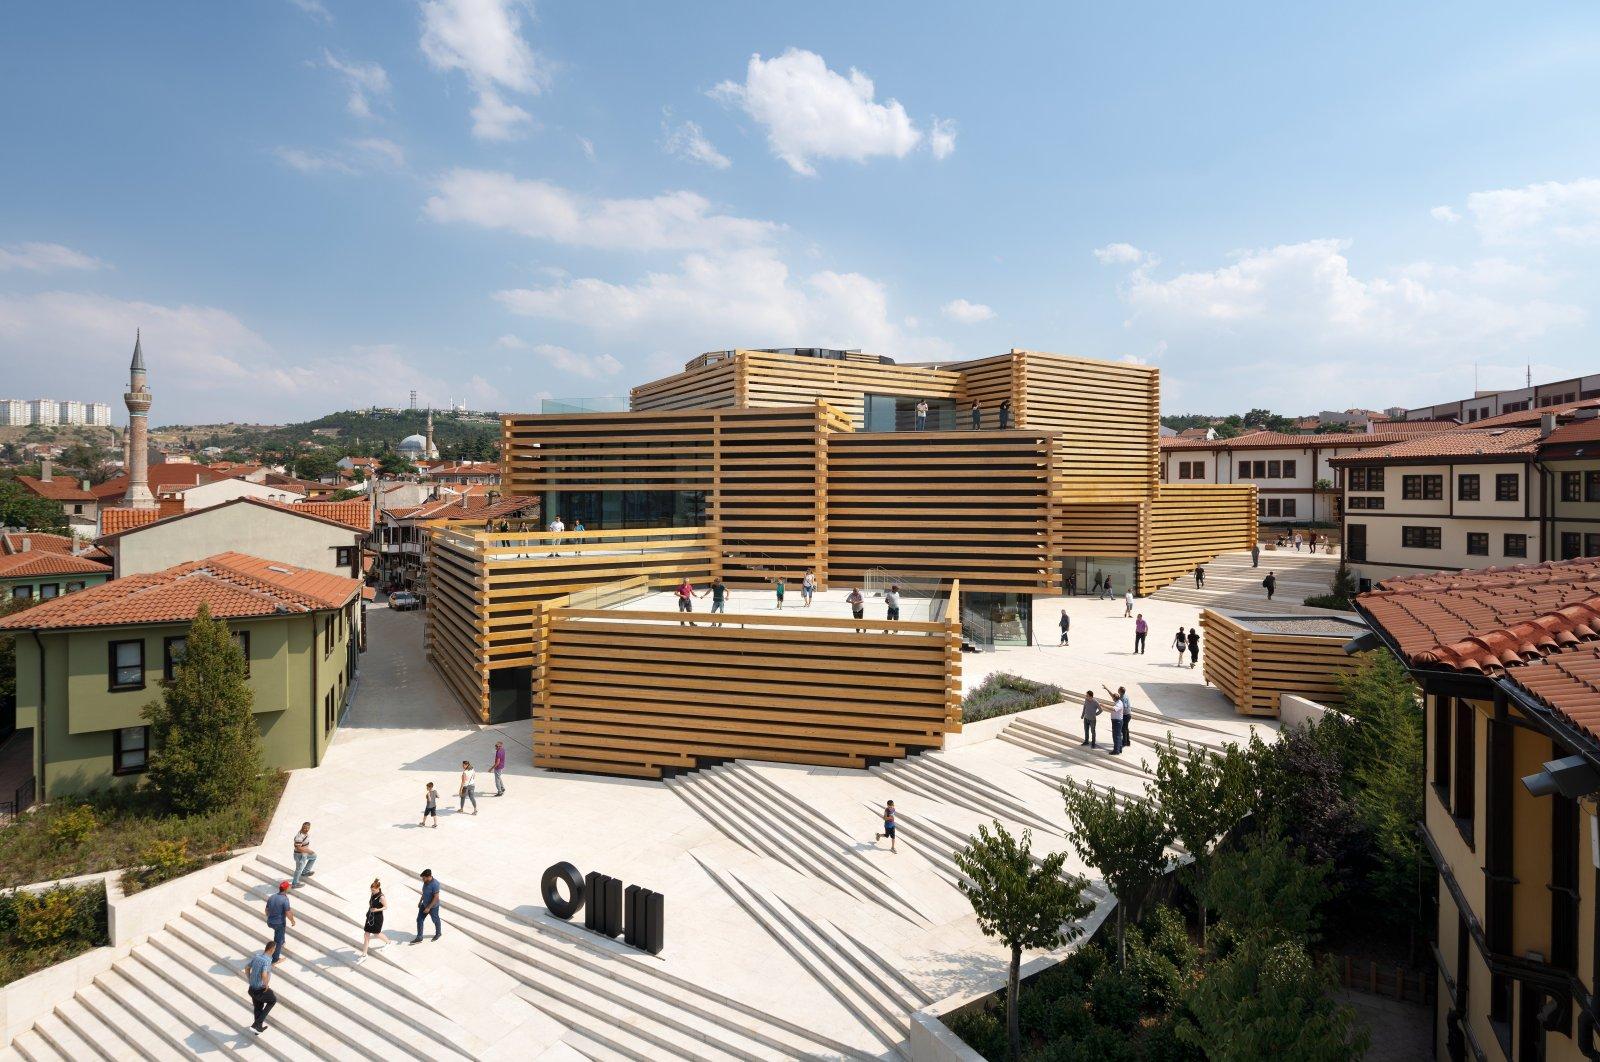 The Odunpazarı Modern Museum is located among the historic houses in the Odunpazarı district in Turkey's Eskişehir.